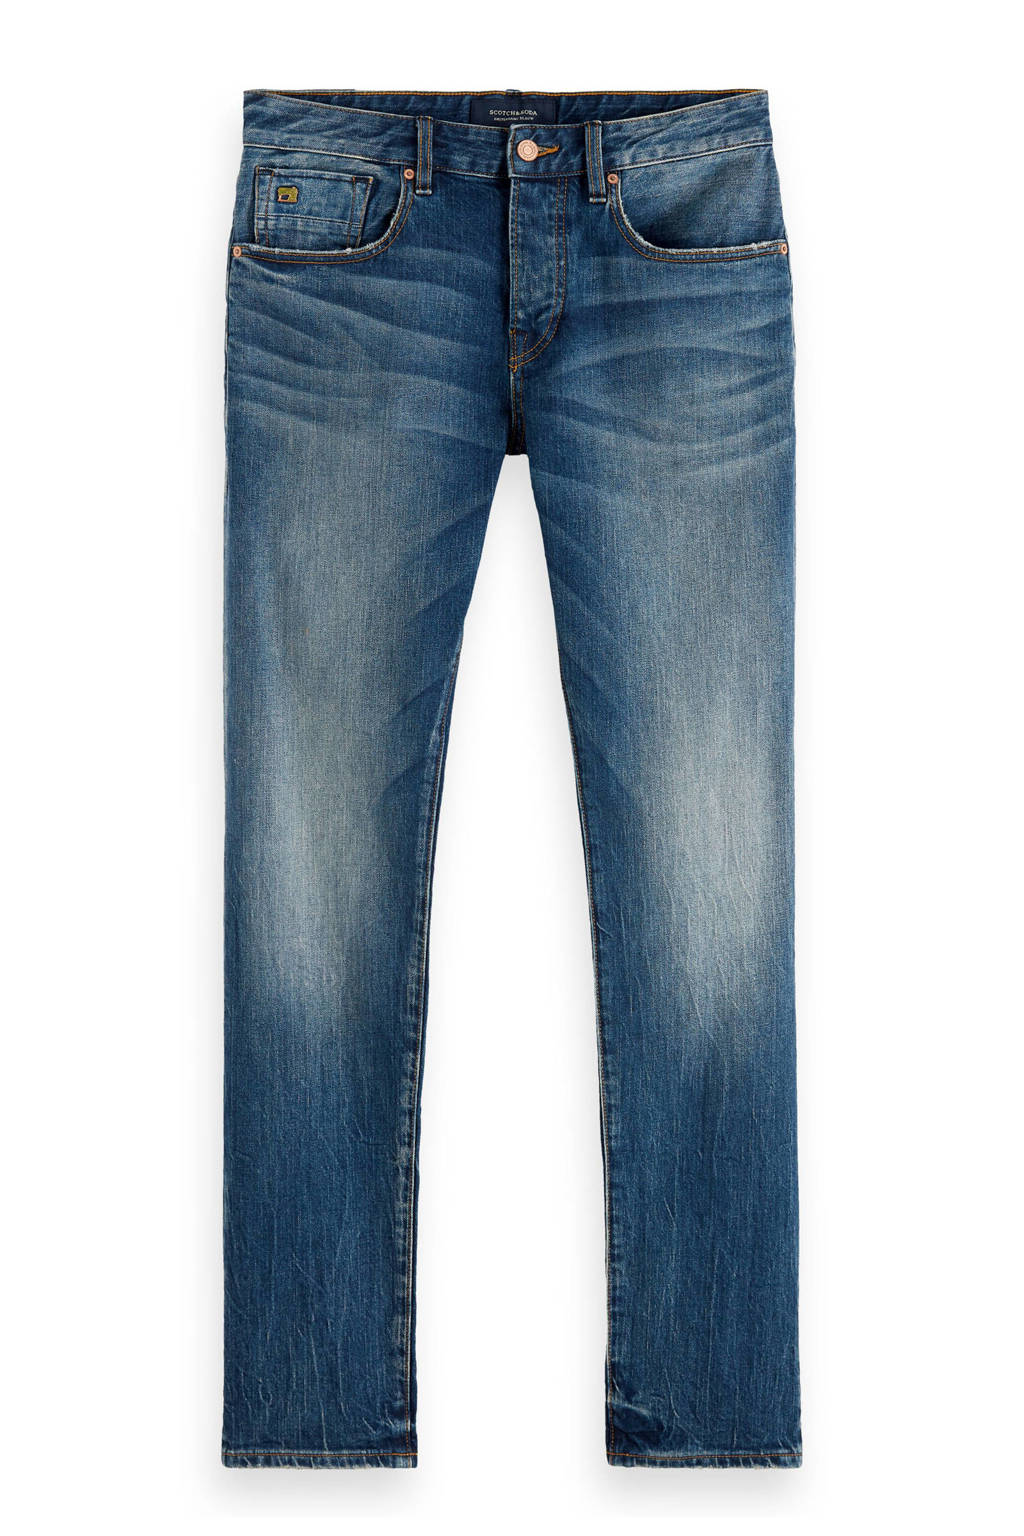 Scotch & Soda slim fit jeans Ralston handcraft, 3357 Handcraft